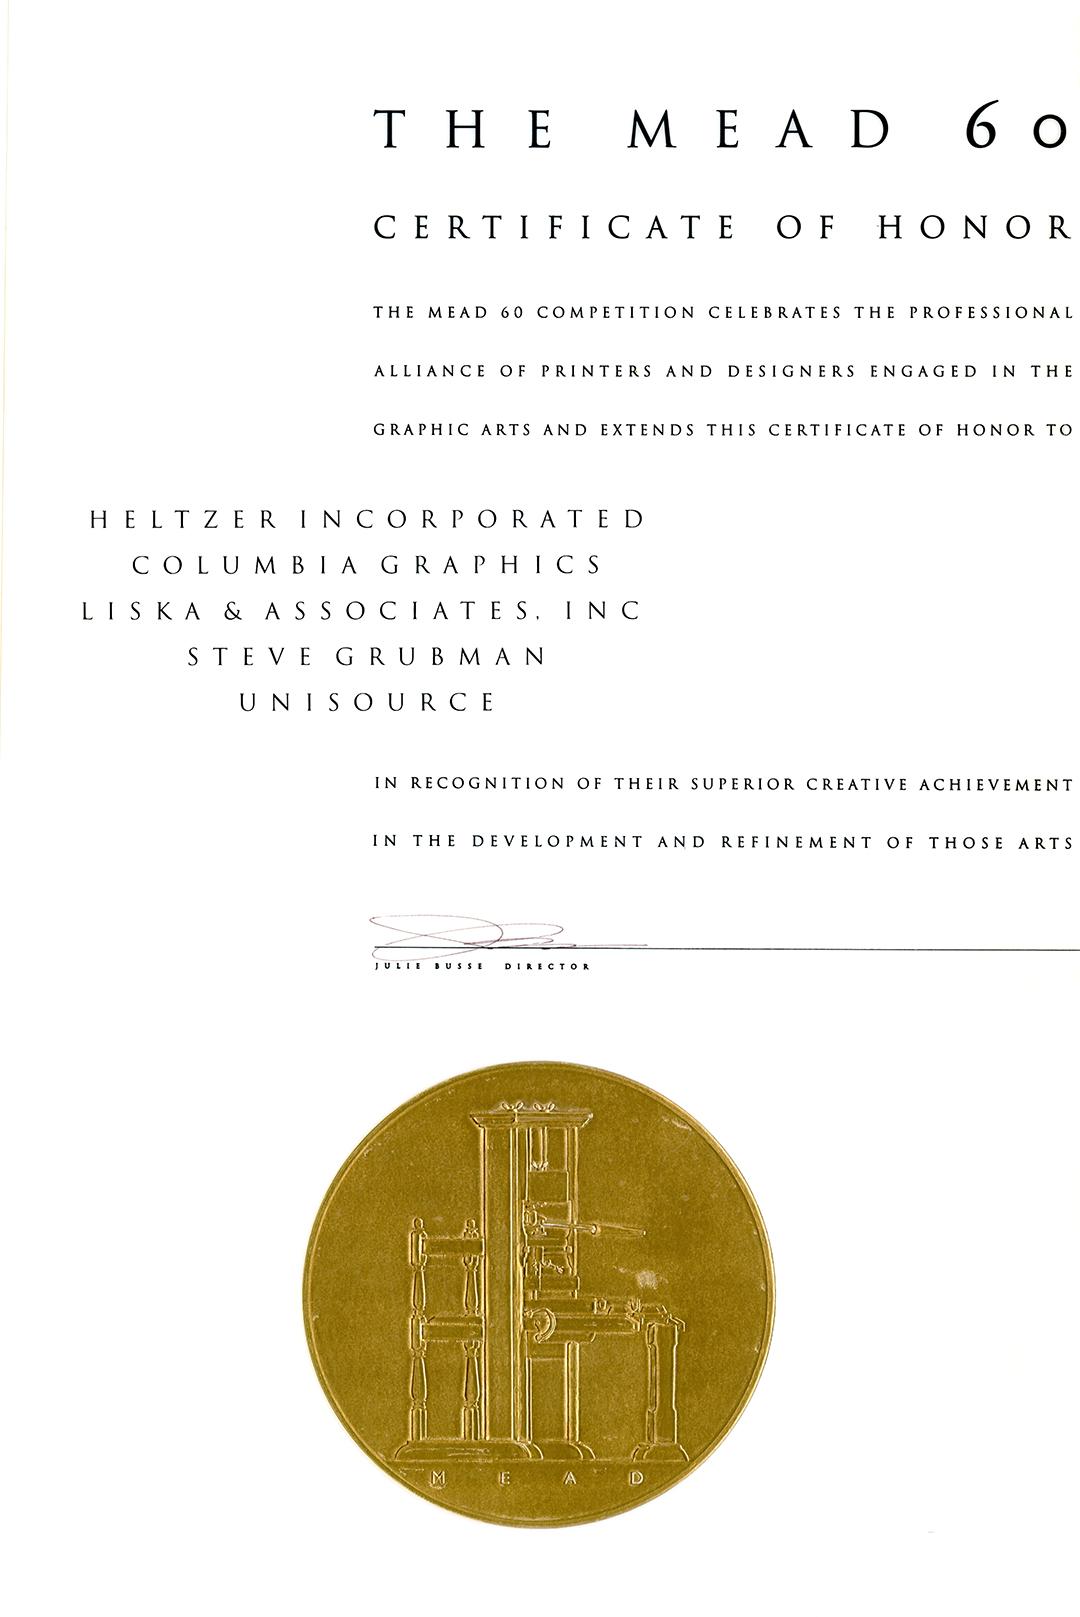 Mead 60 Certificate